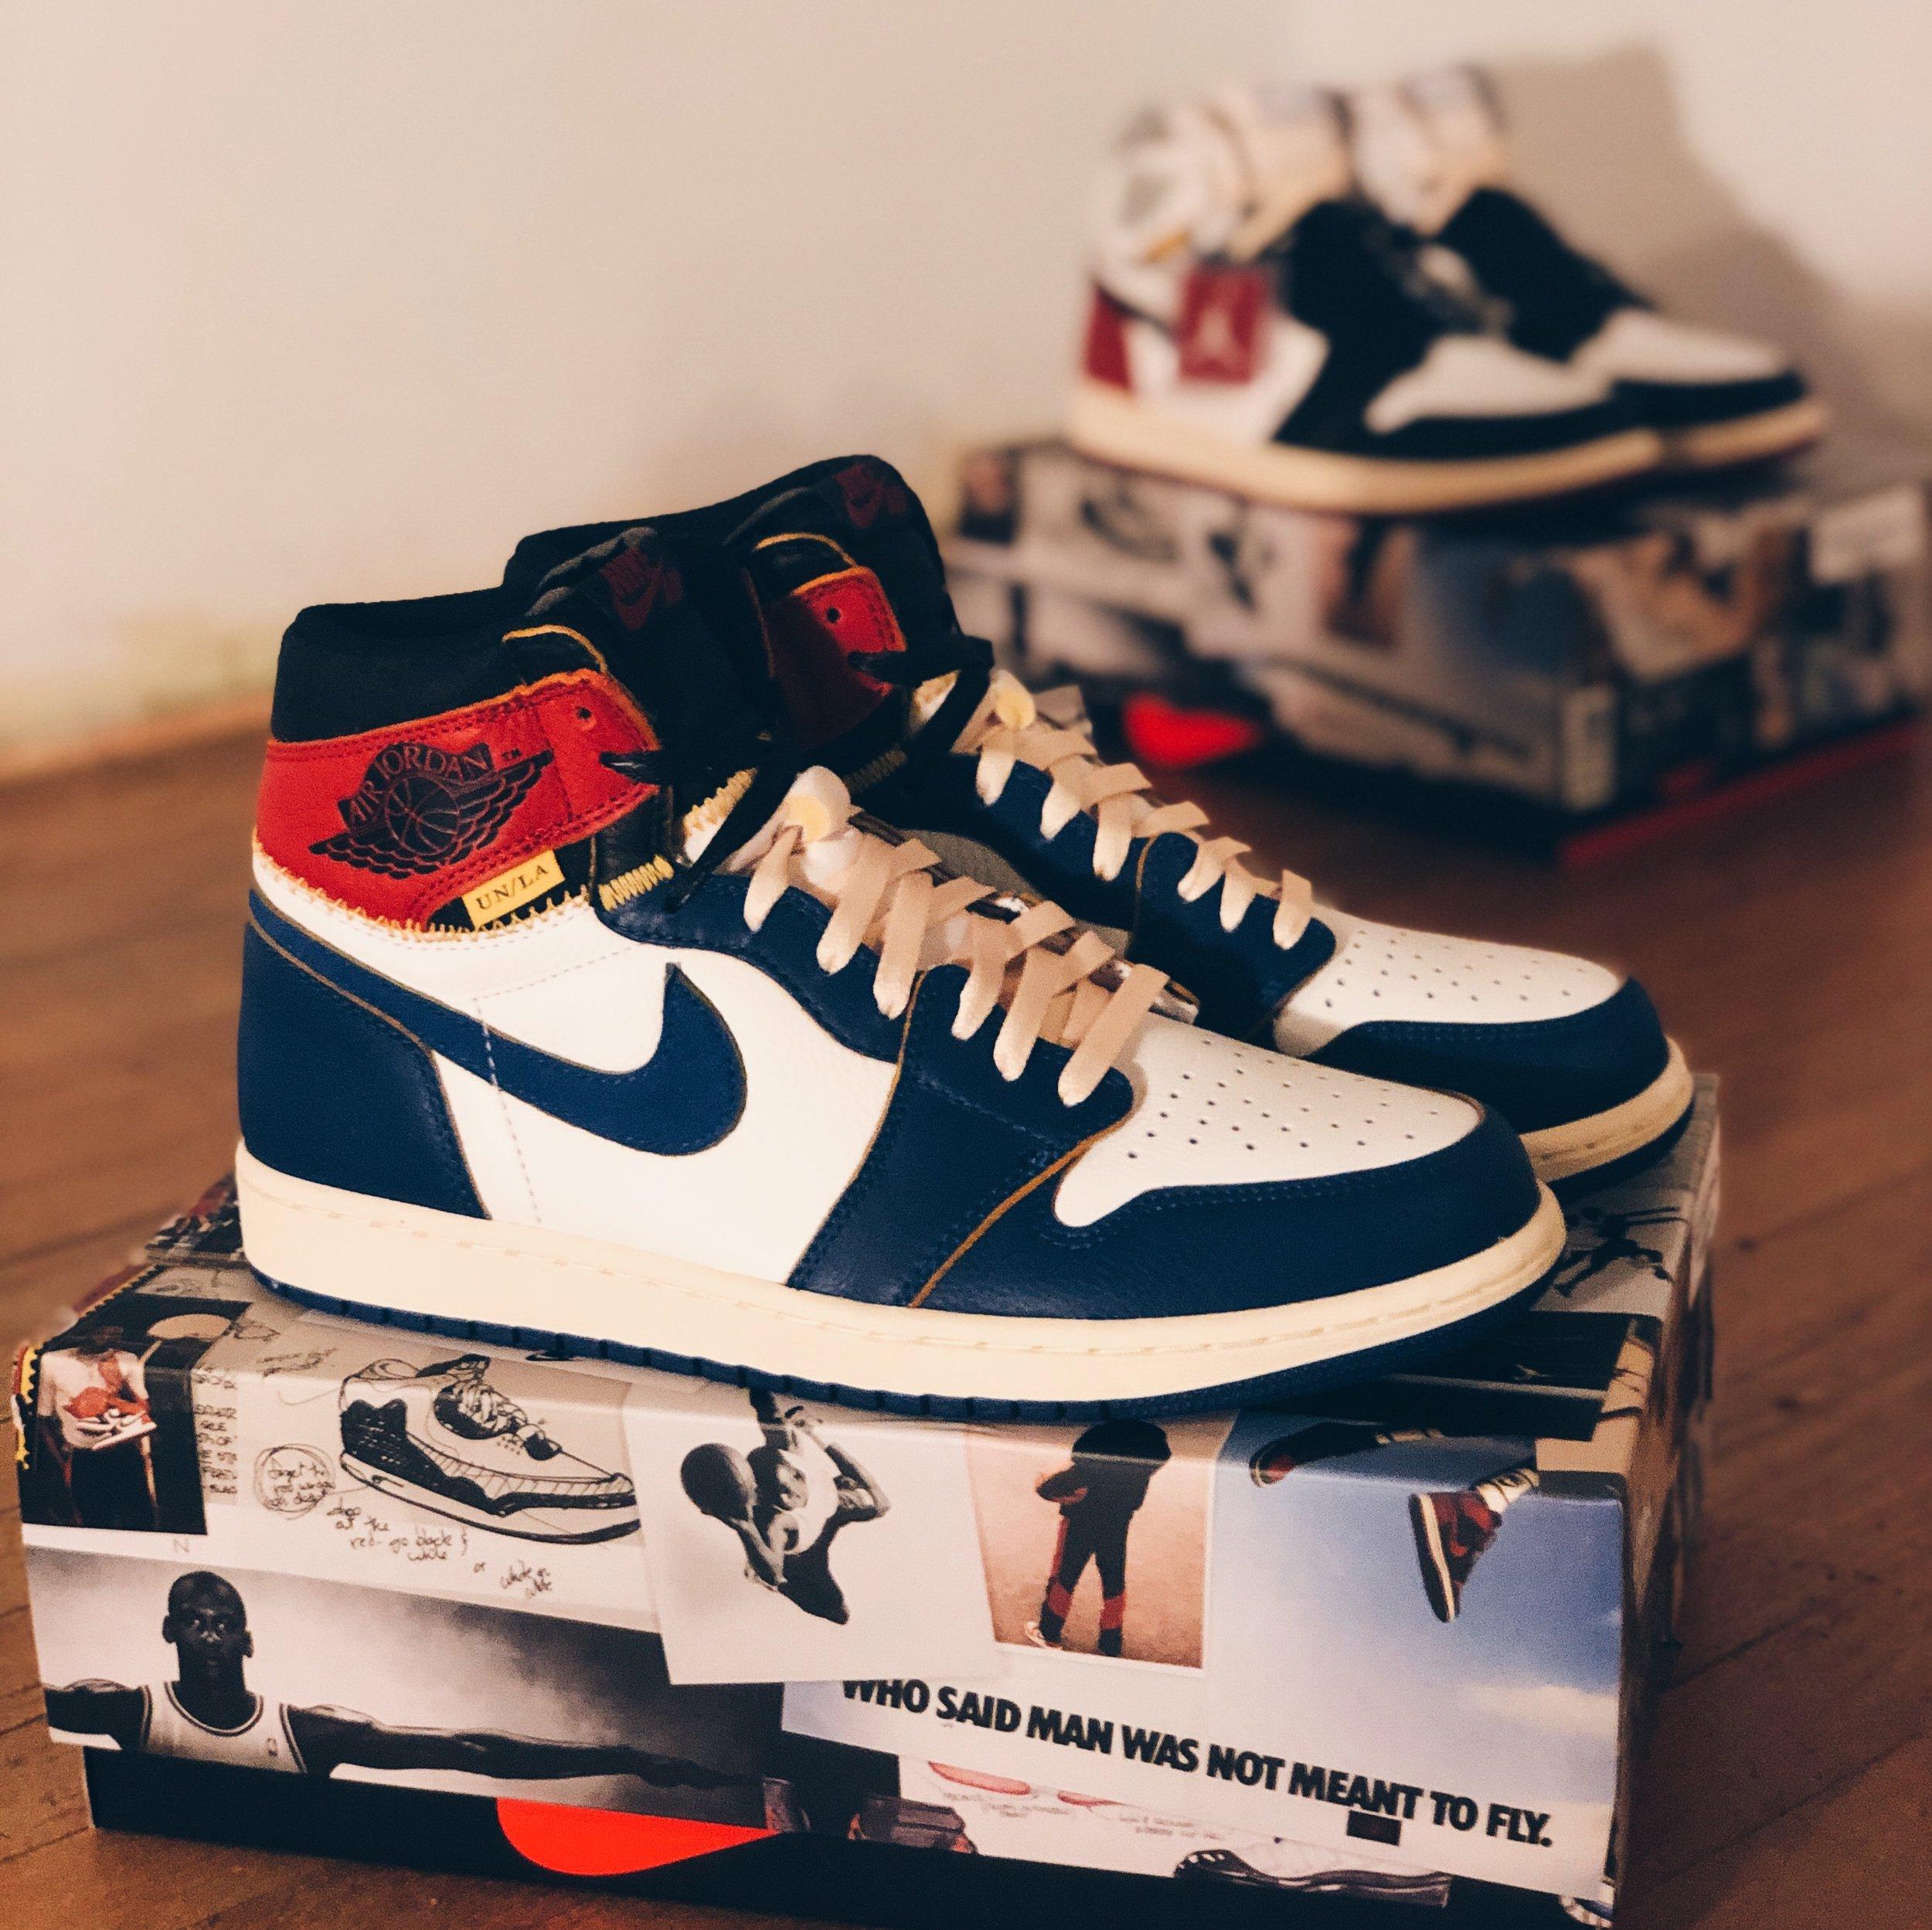 Air Jordan x Union I's